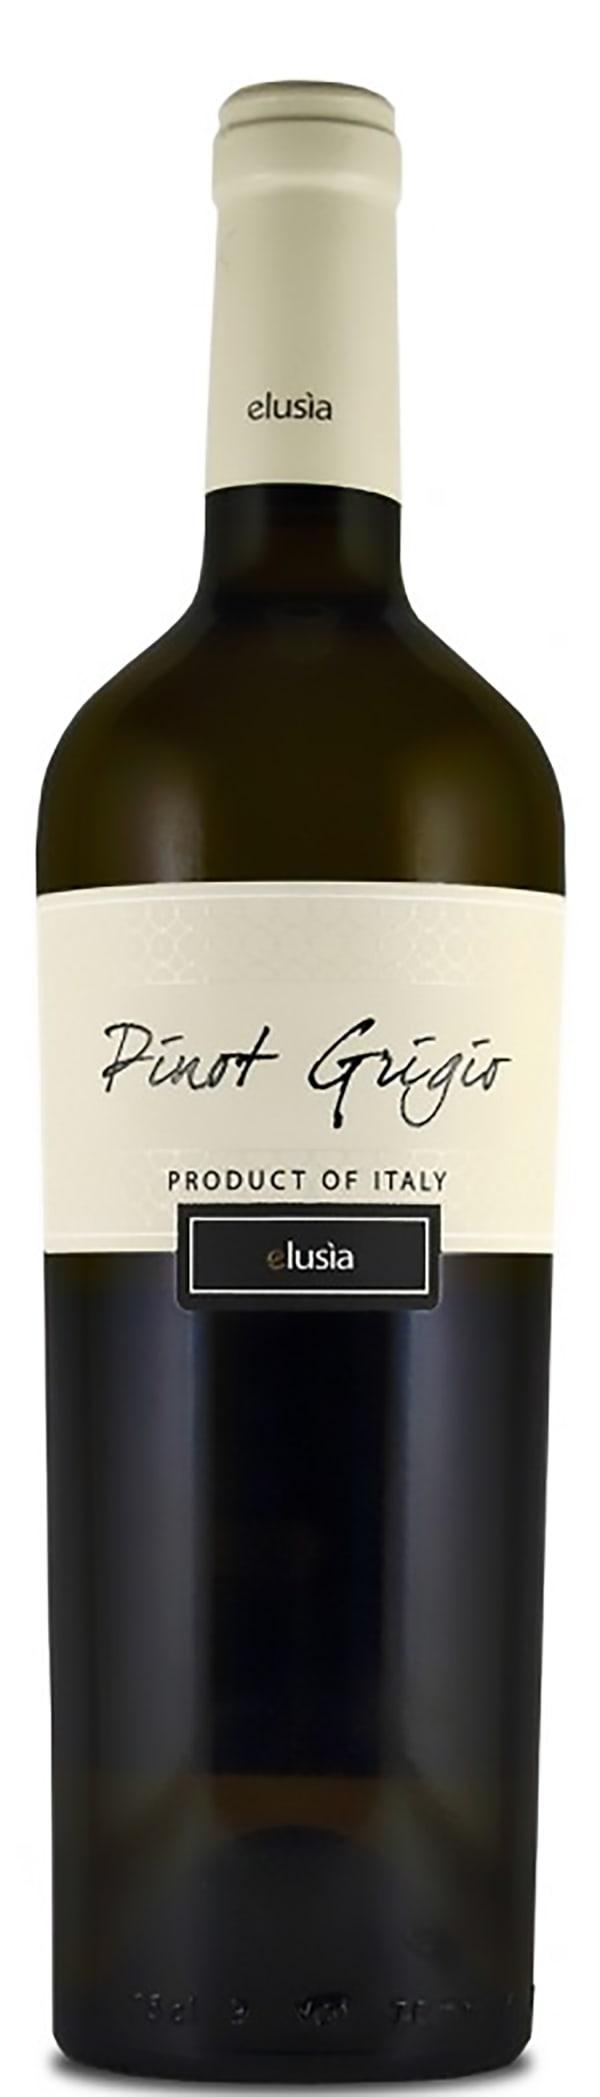 Elusìa Pinot Grigio 2018